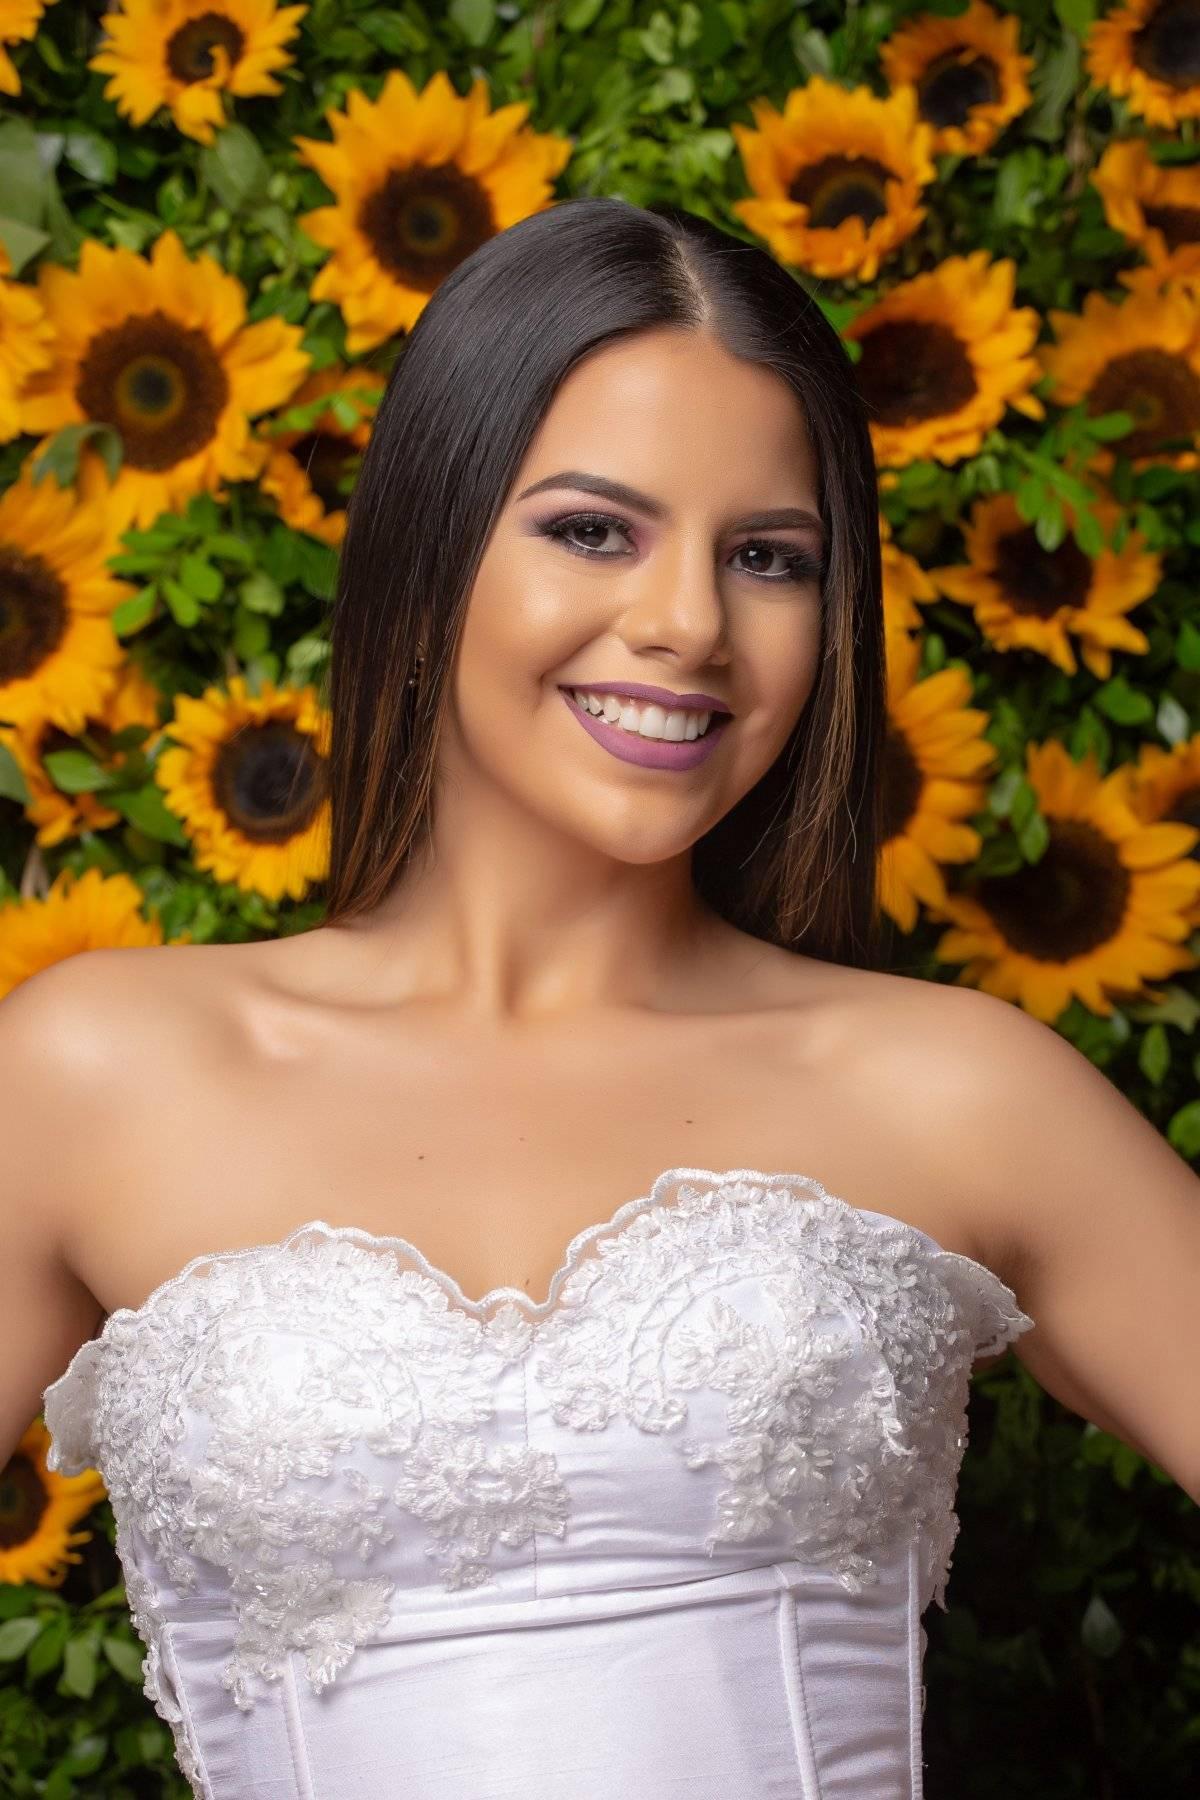 CANDIDATAS A MISS ECUADOR 2019.  FINAL 19 DE JULIO - Página 2 21annelieruizmachala-cfac48695fa71b63668927bc0f3c8f62-1200x0